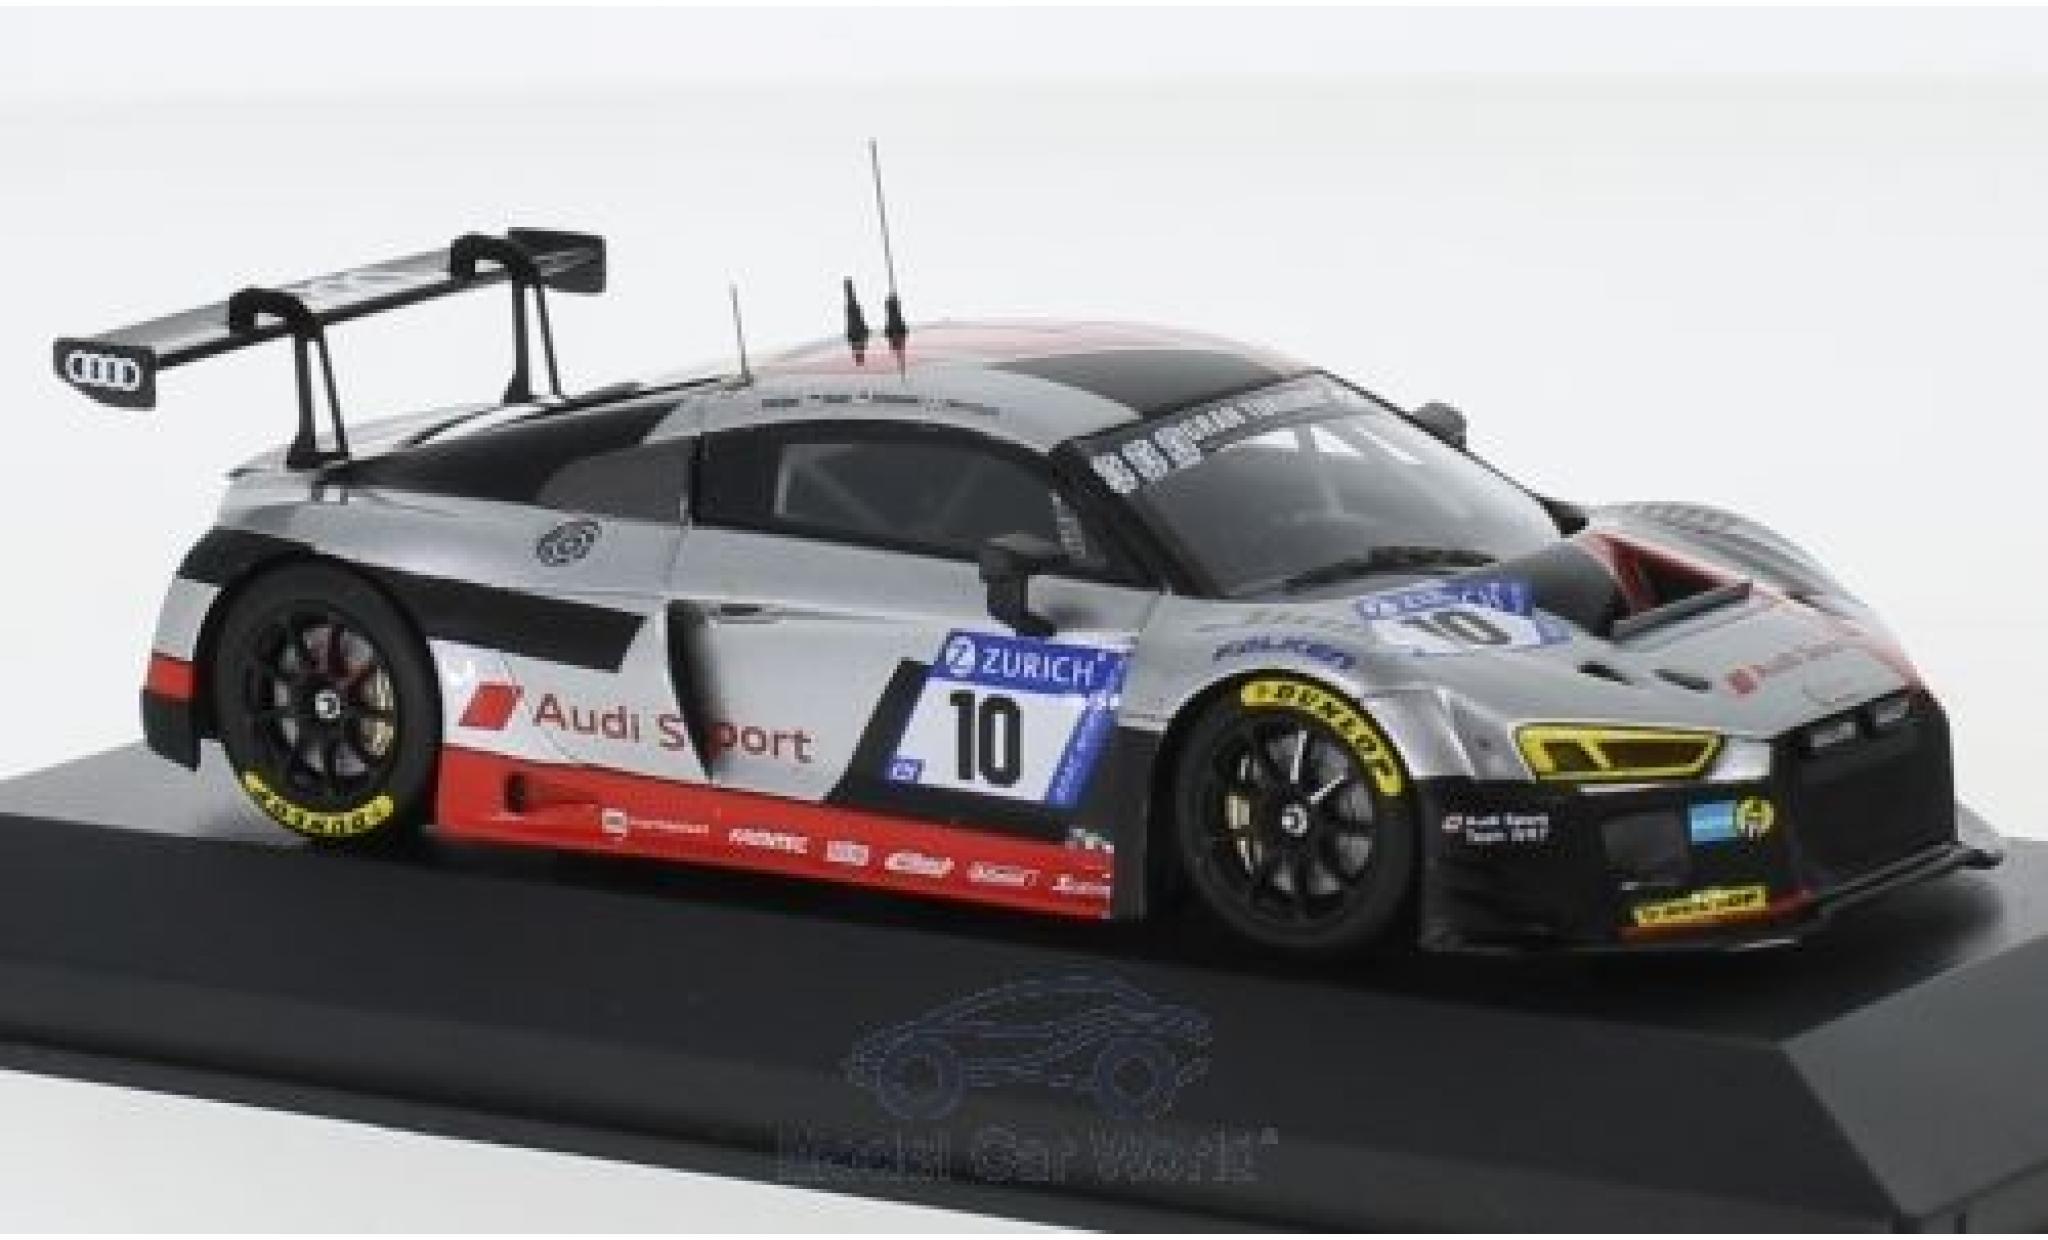 Audi R8 1/43 Minichamps LMS No.10 Sport Team WRT 24h Nürburgring 2017 F.Stippler/R.Rast/F.Vervisch/N.Müller